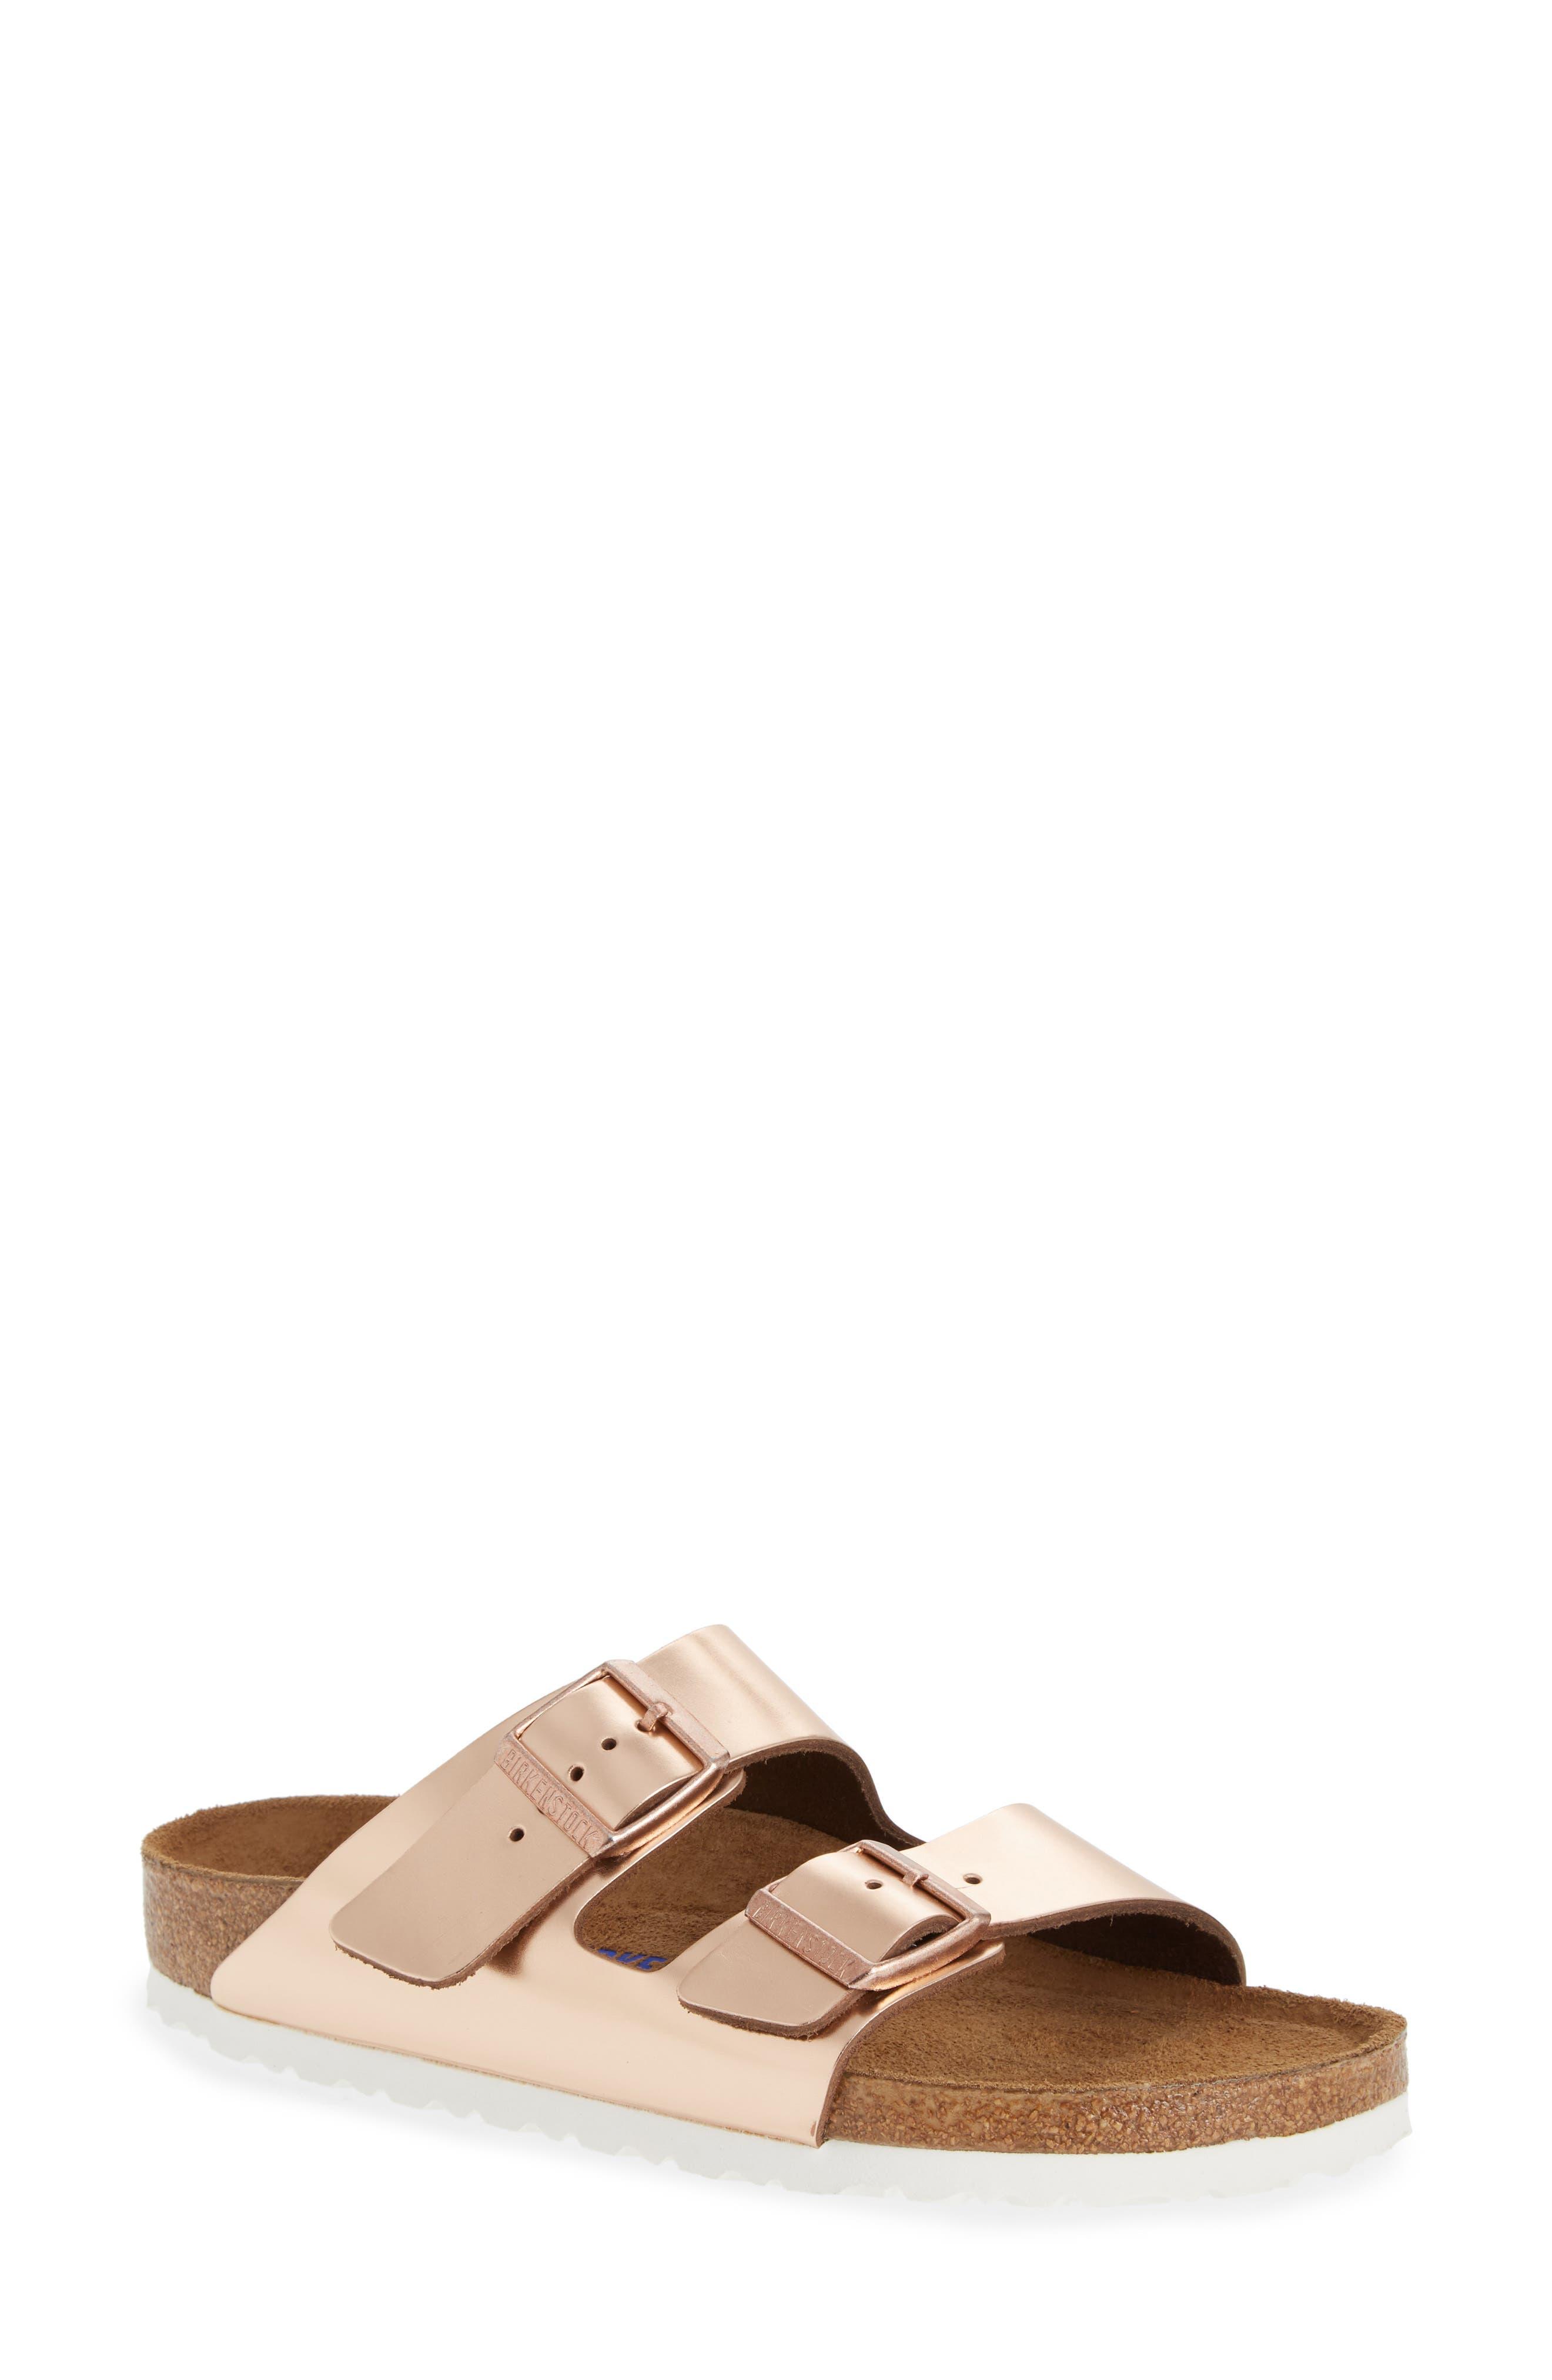 Arizona Soft Footbed Sandal, Main, color, COPPER LEATHER